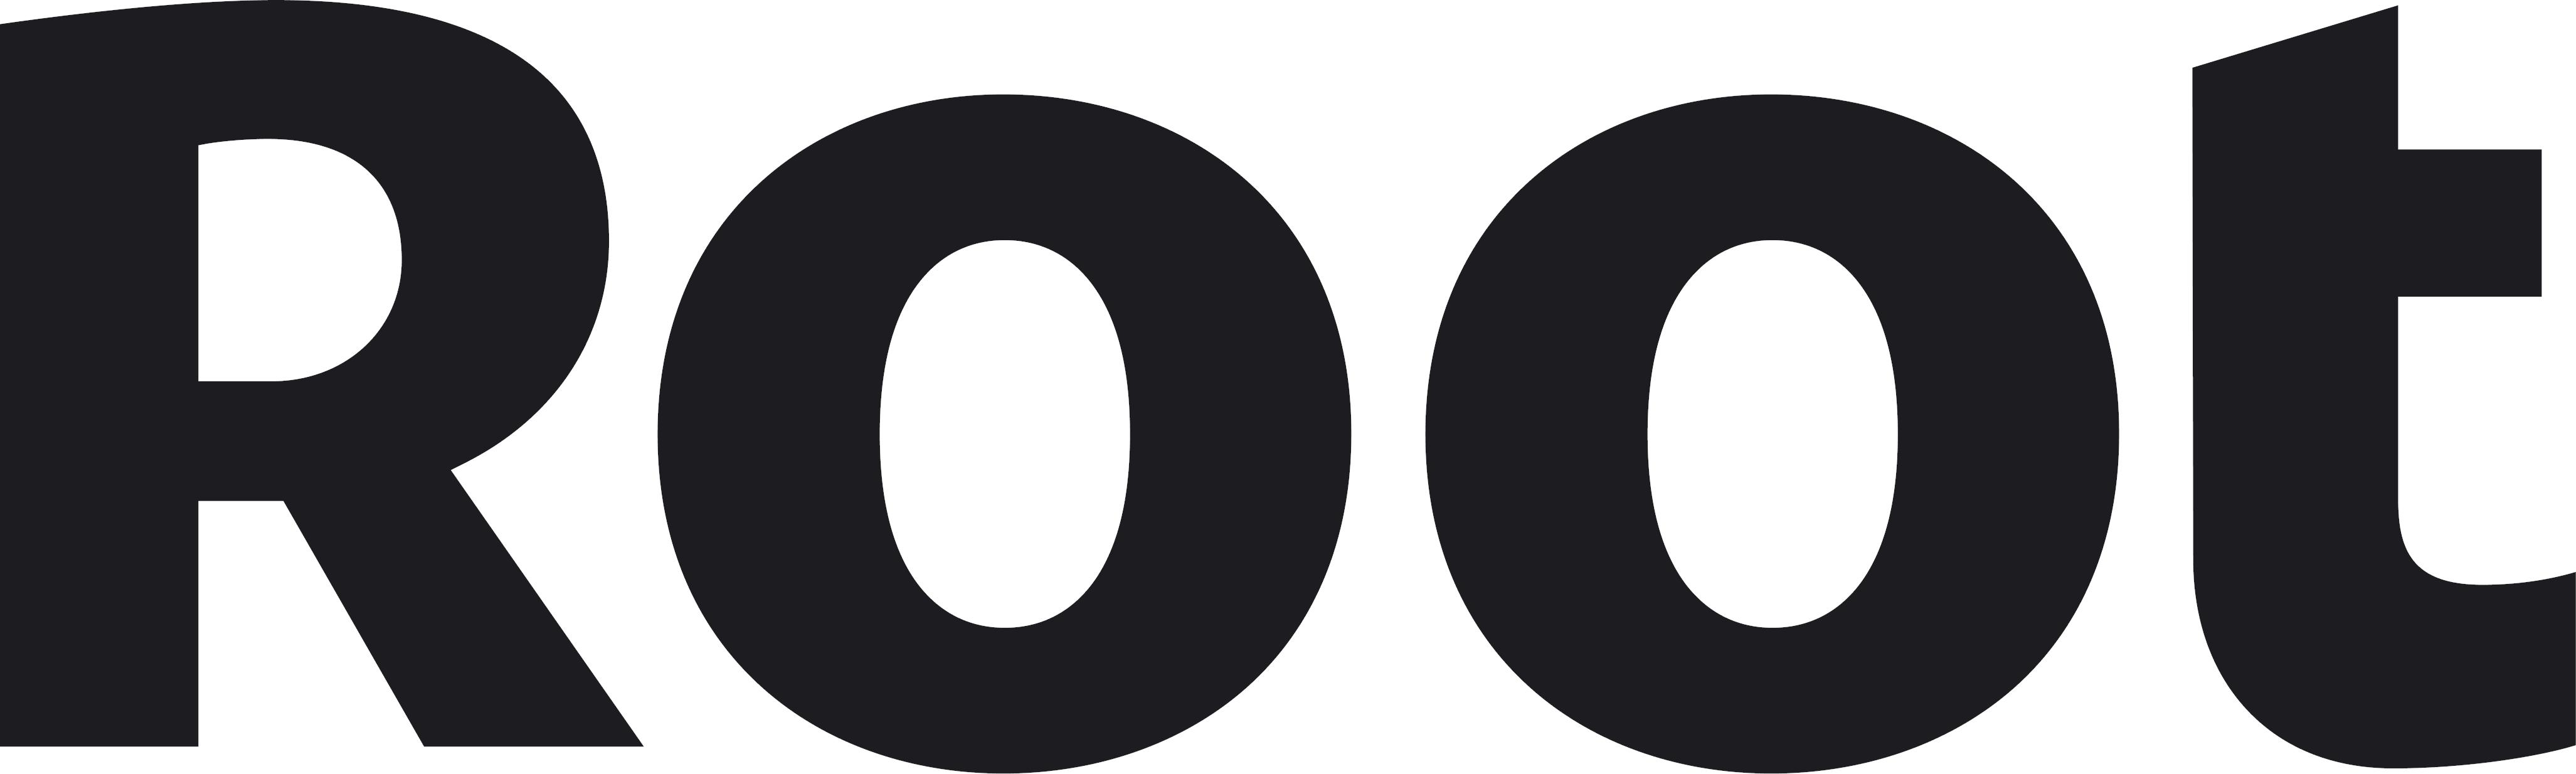 https://cdn.kscope.io/5eb29ca1ed31a40092fe60db6529f613-root-logo2.jpg